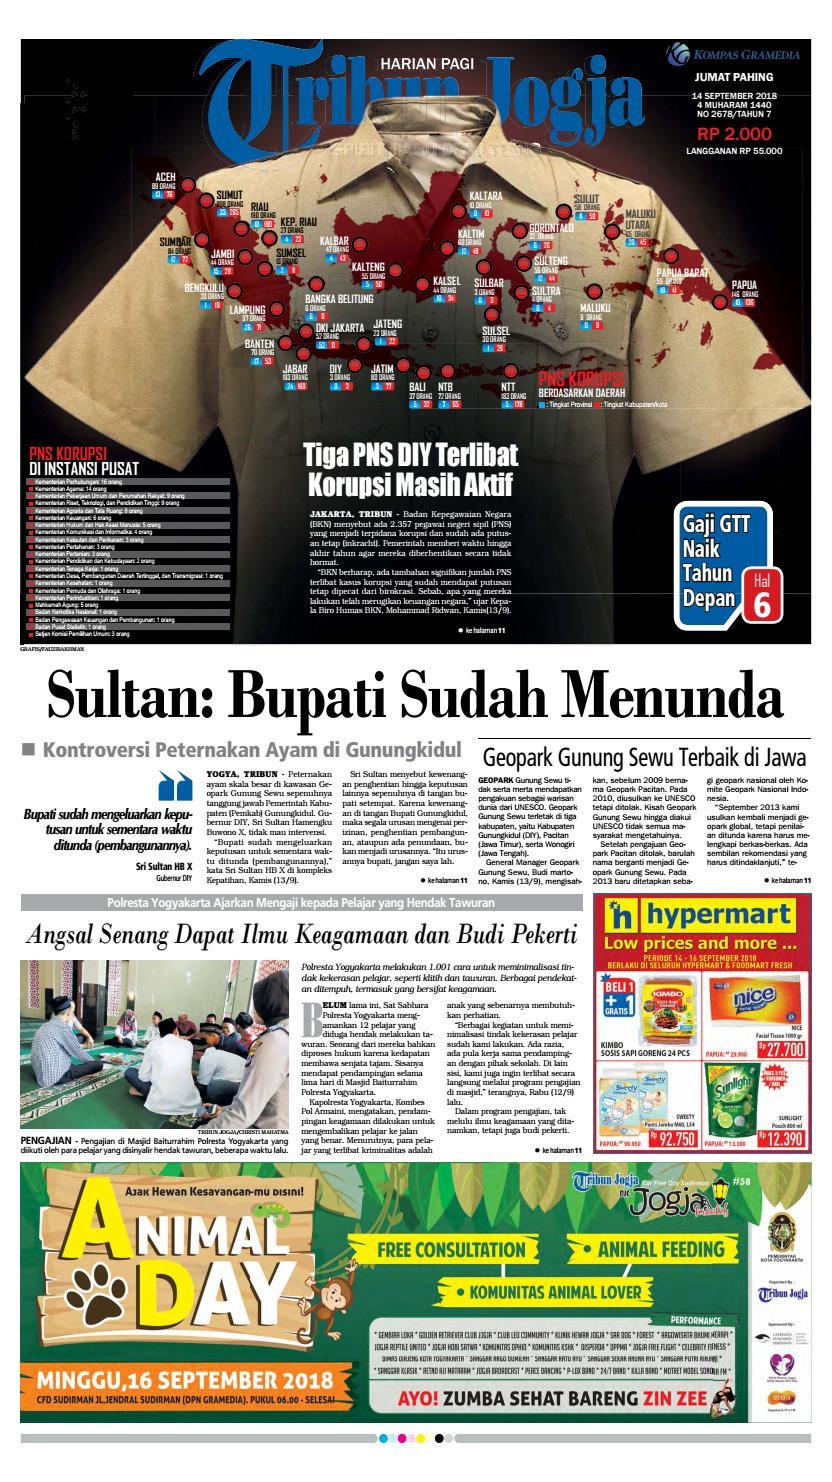 Tribun Jogja 14 09 2018 By Issuu Produk Ukm Bumn Ring Mutiara Mas Putih Laut